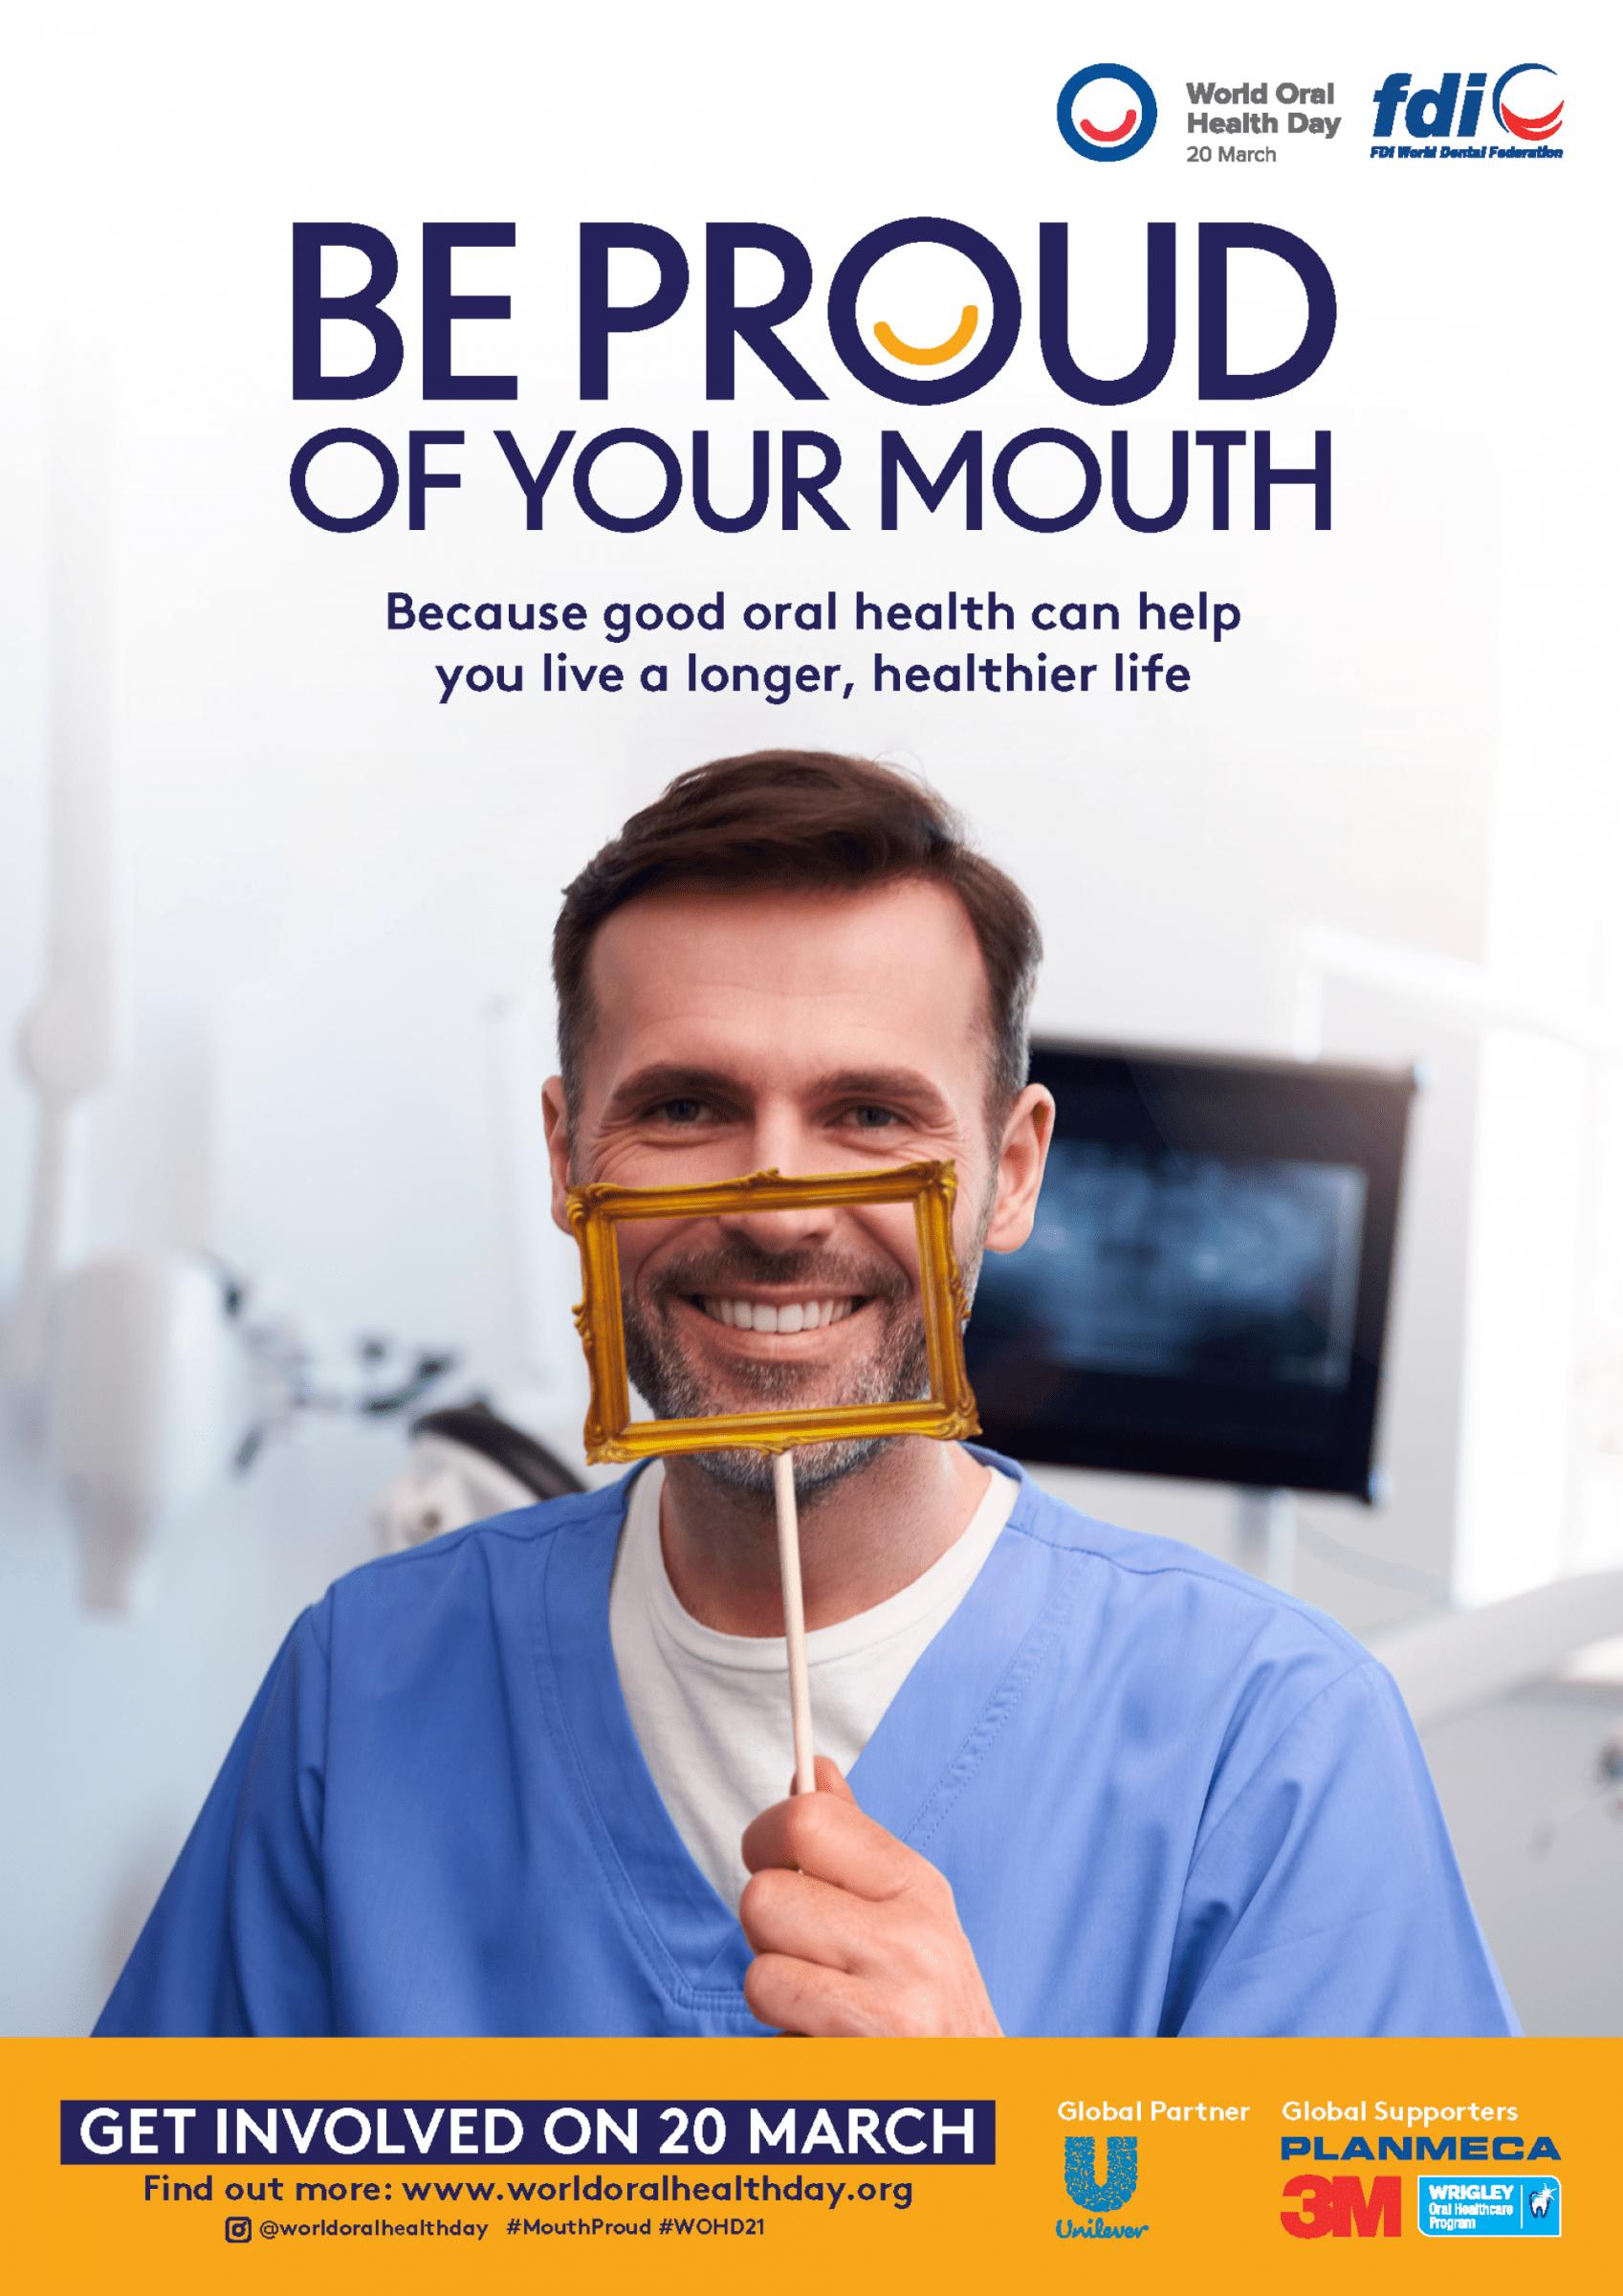 FDI World Dental Federation Celebrates World Oral Health Day 2021 to 2023